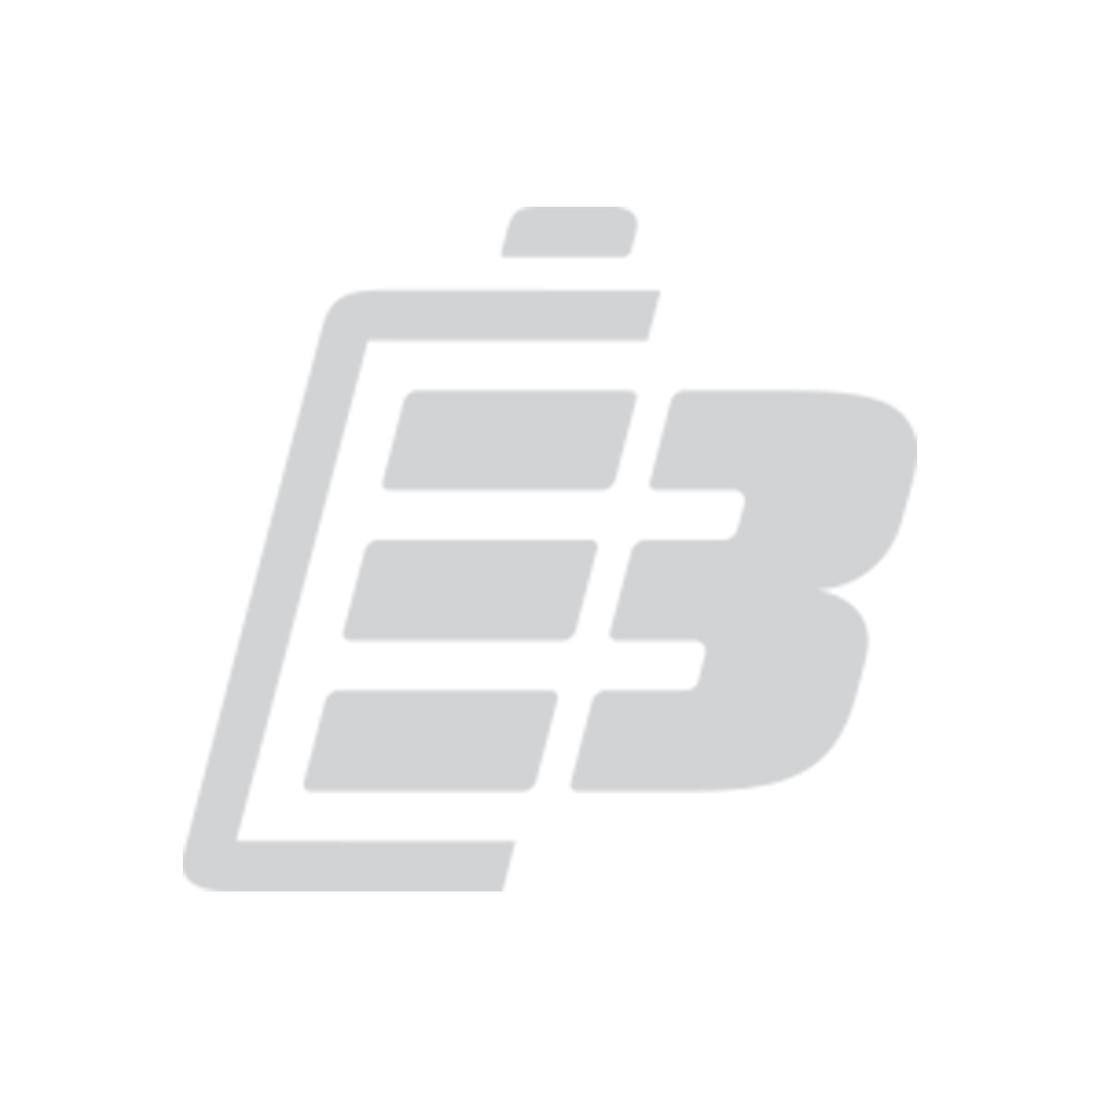 Choetech SC004 Solar Panel 14W 1